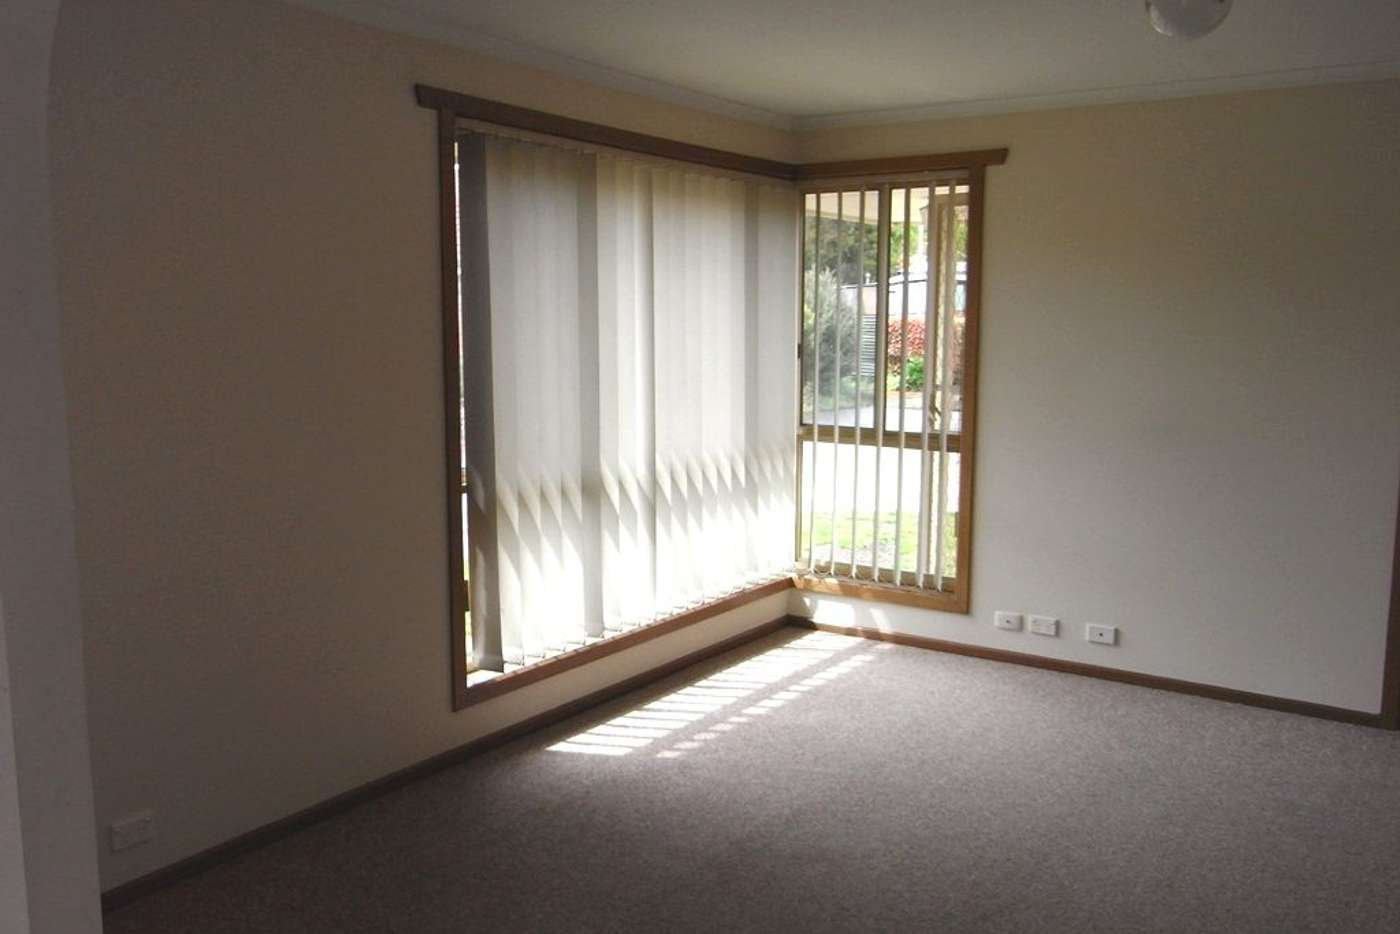 Sixth view of Homely unit listing, 4/272 Albert Street, Sebastopol VIC 3356